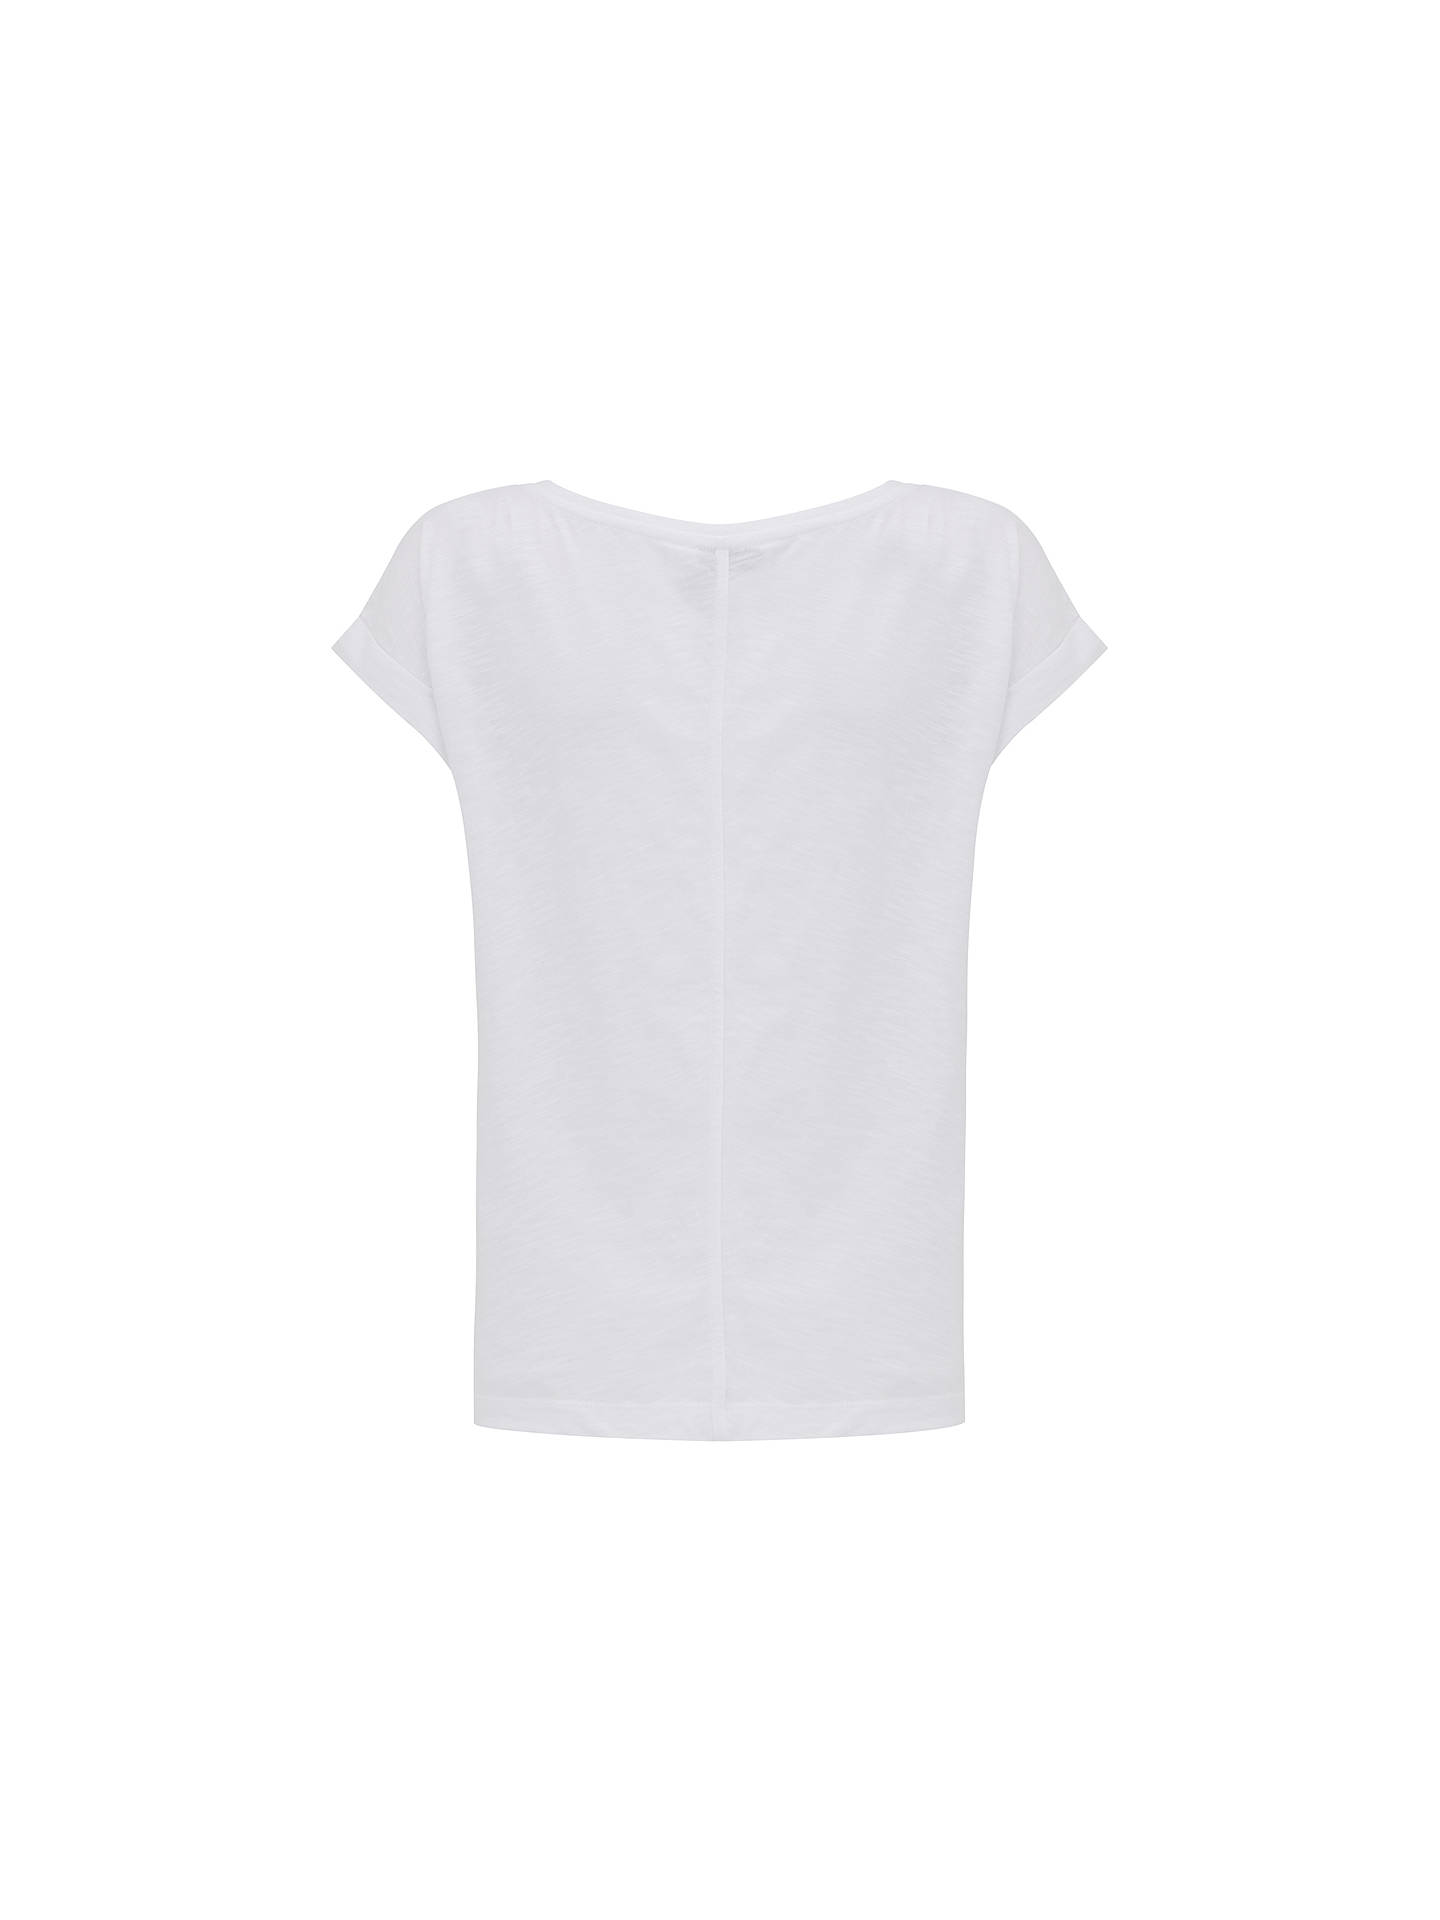 88506a931ddc ... Buy Mint Velvet Leopard Foil Printed T-Shirt, White, M Online at  johnlewis